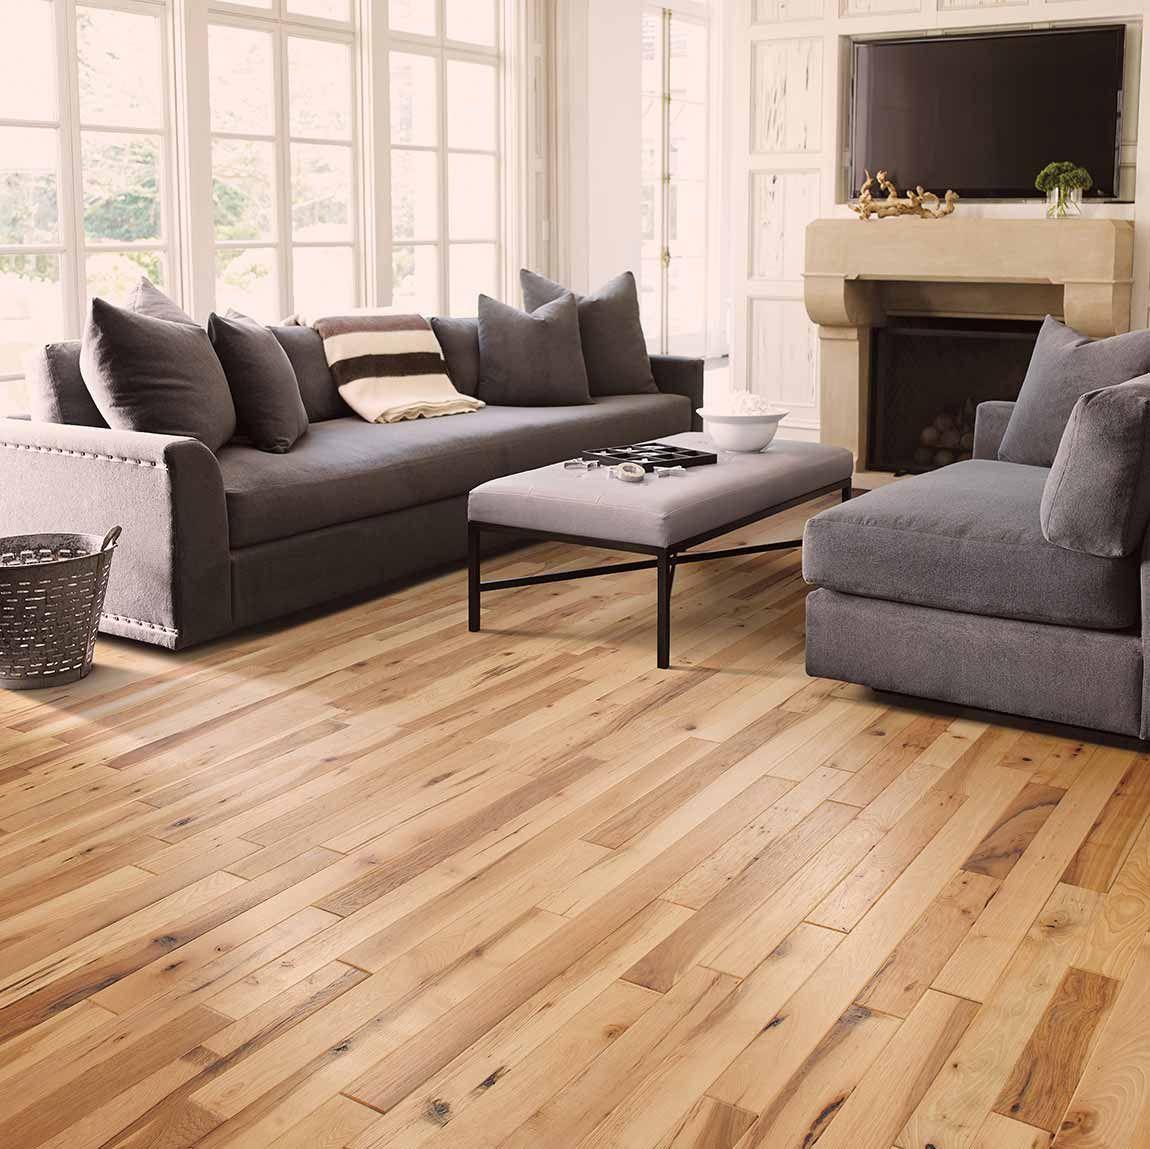 Living RoomTransitionalWood LookMedium Shaw flooring